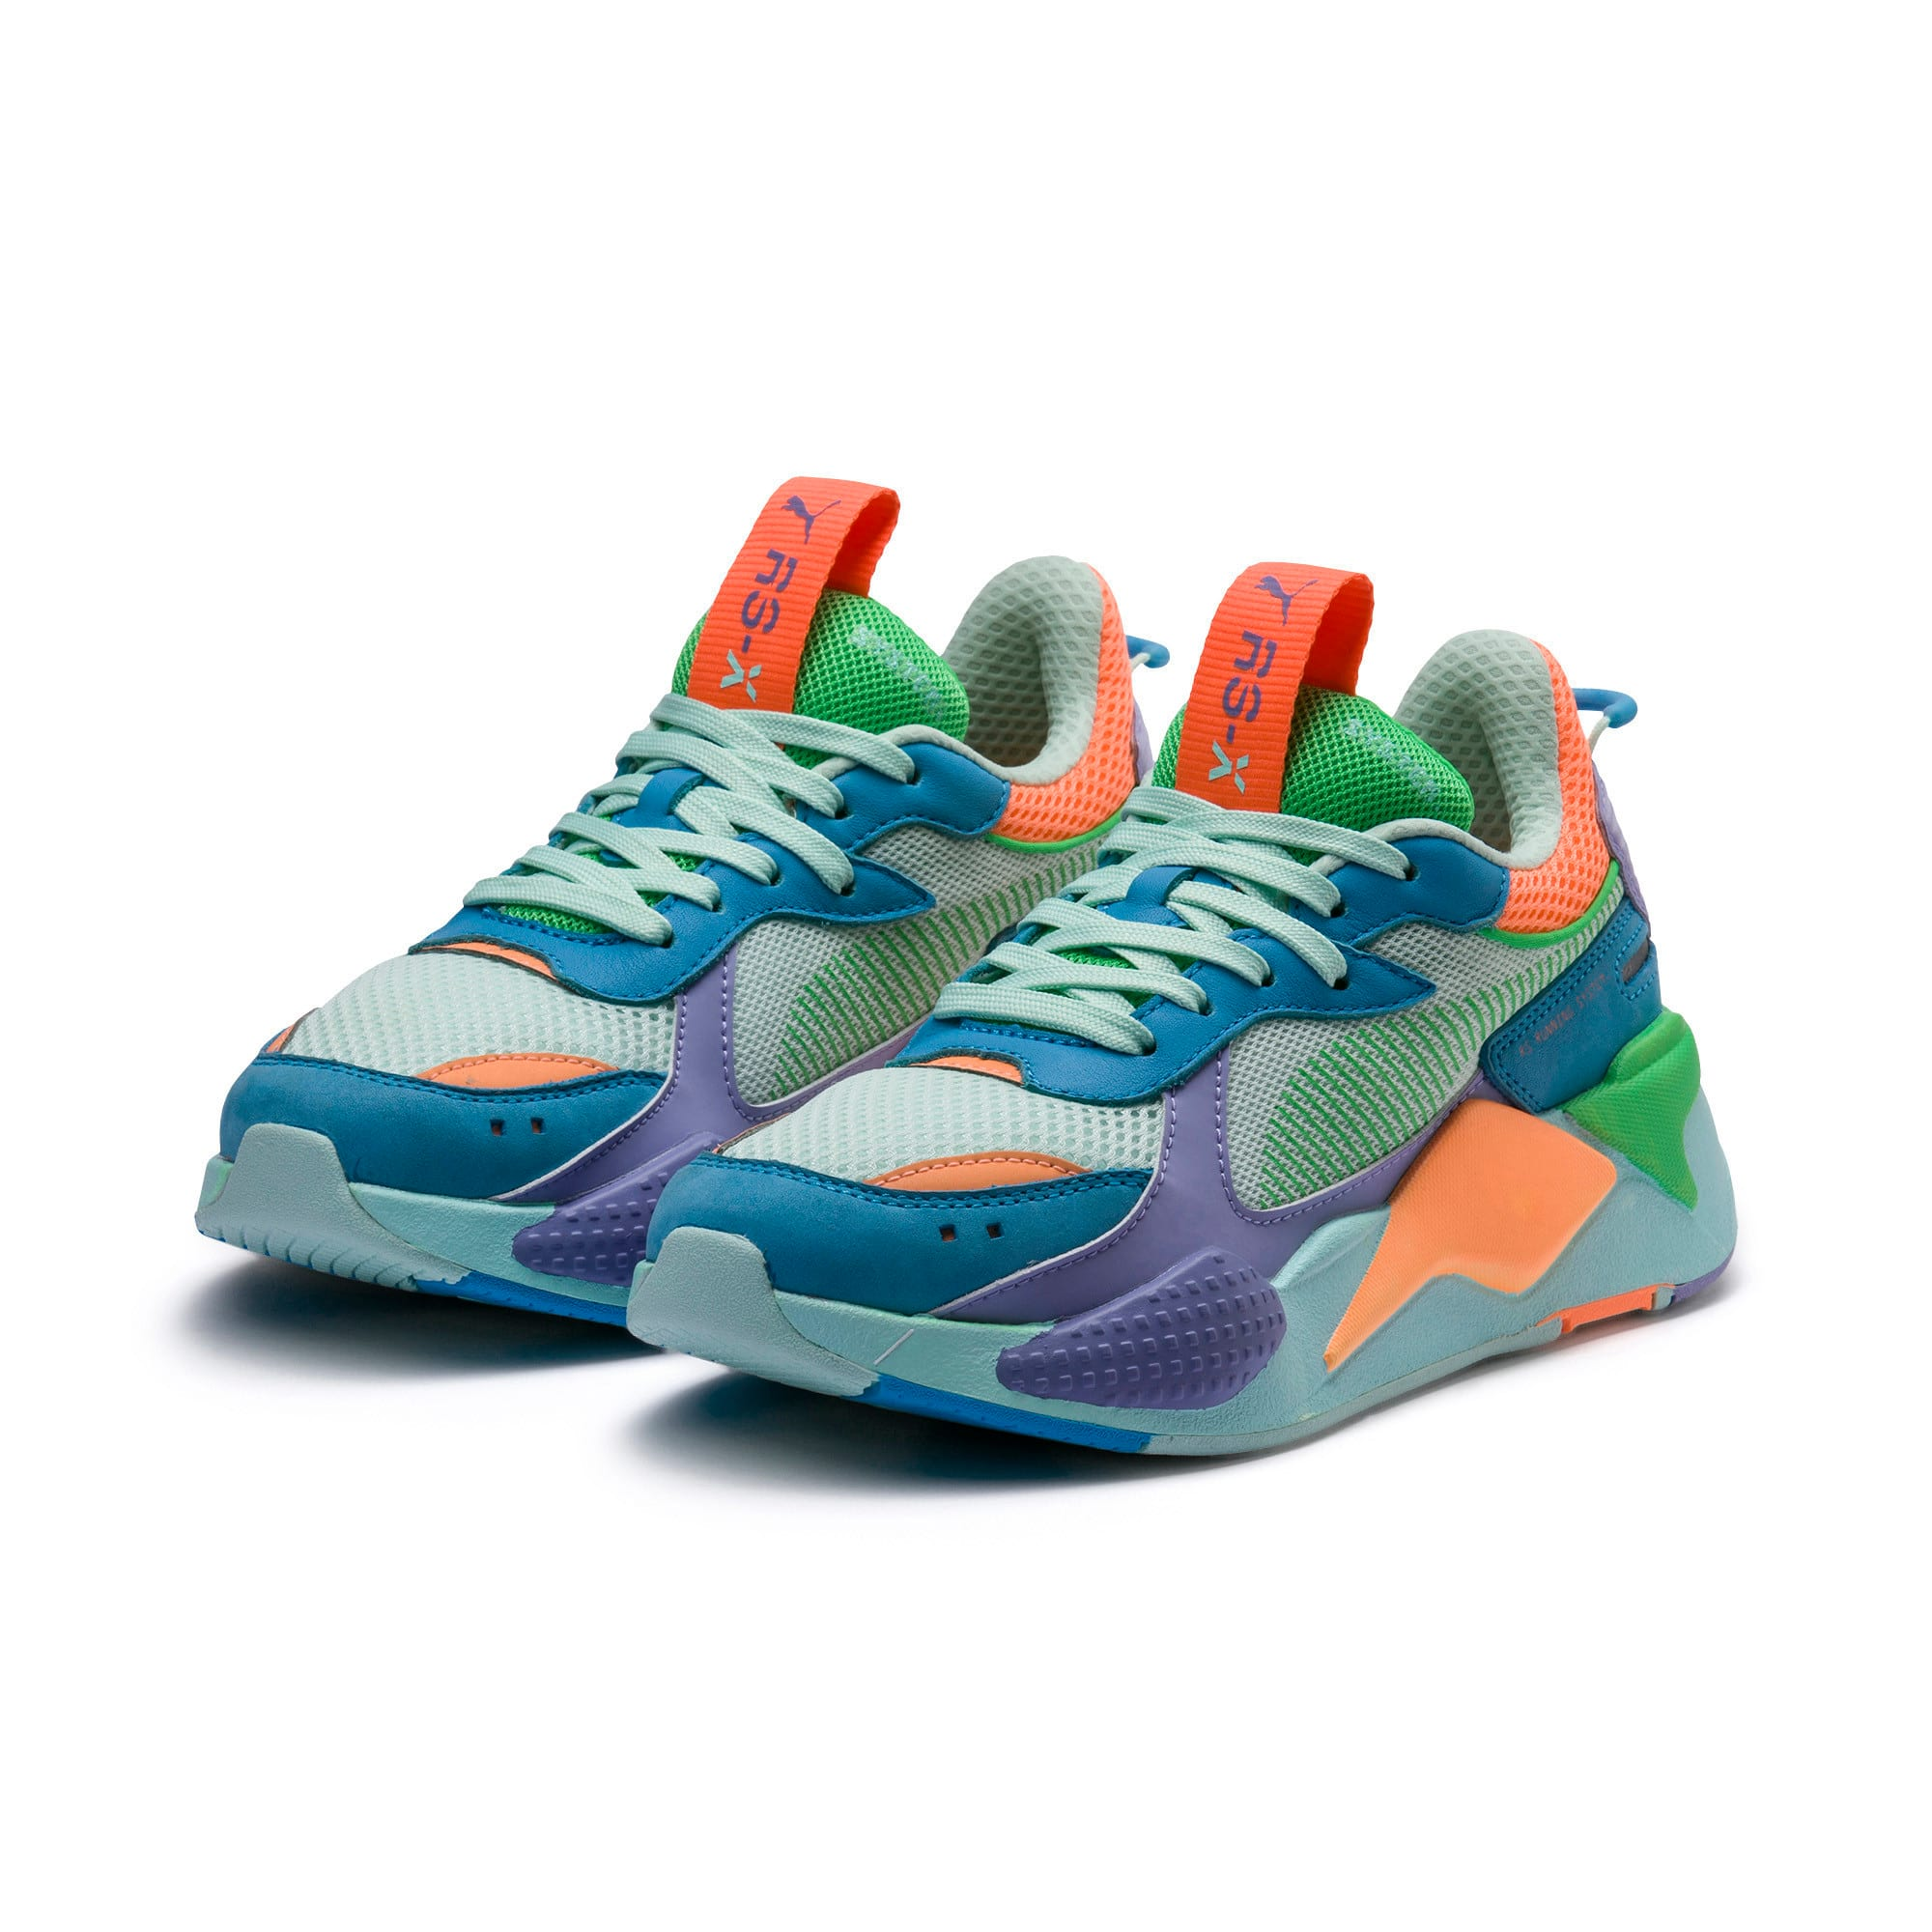 Thumbnail 2 of RS-X Toys Women's Sneakers, Bonnie Blue-Sweet Lavender, medium